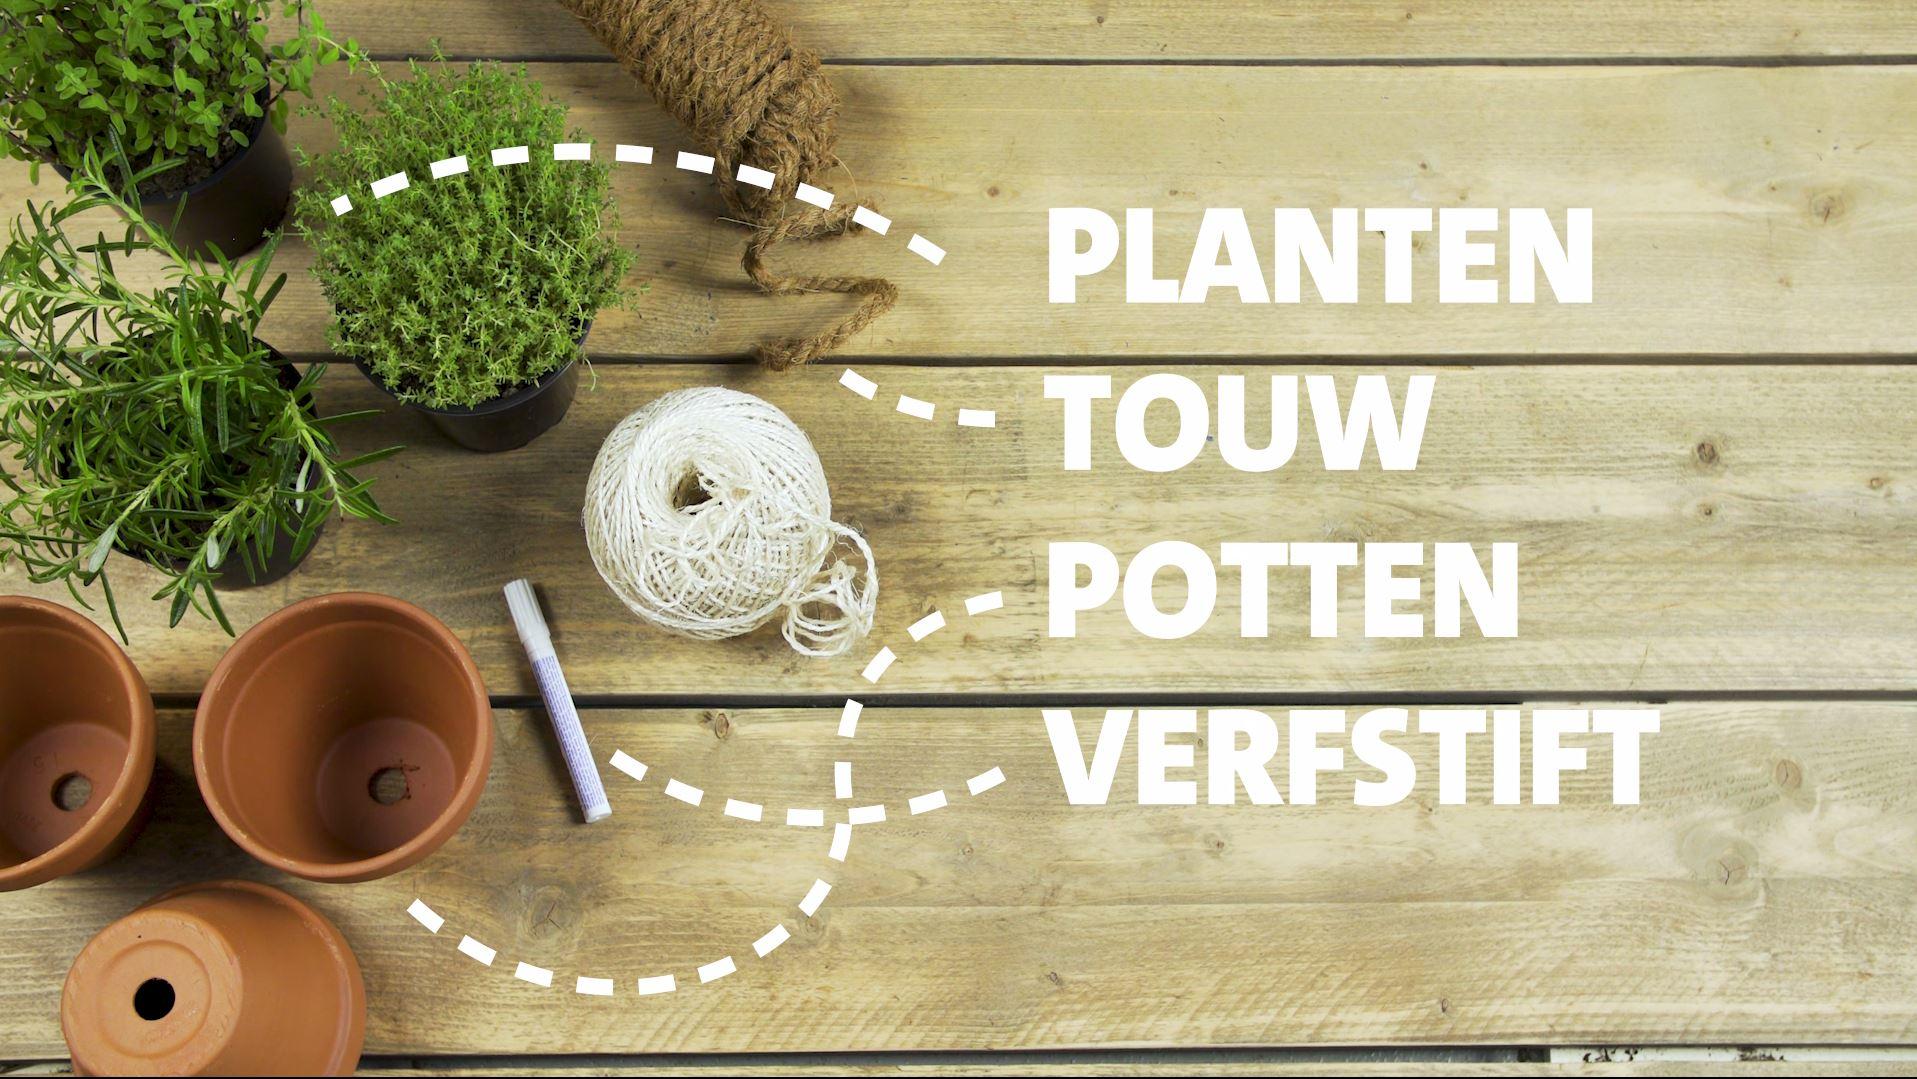 DIY, kruidenhanger, kruidenplantjes, terracotta potten, touw, verfstift